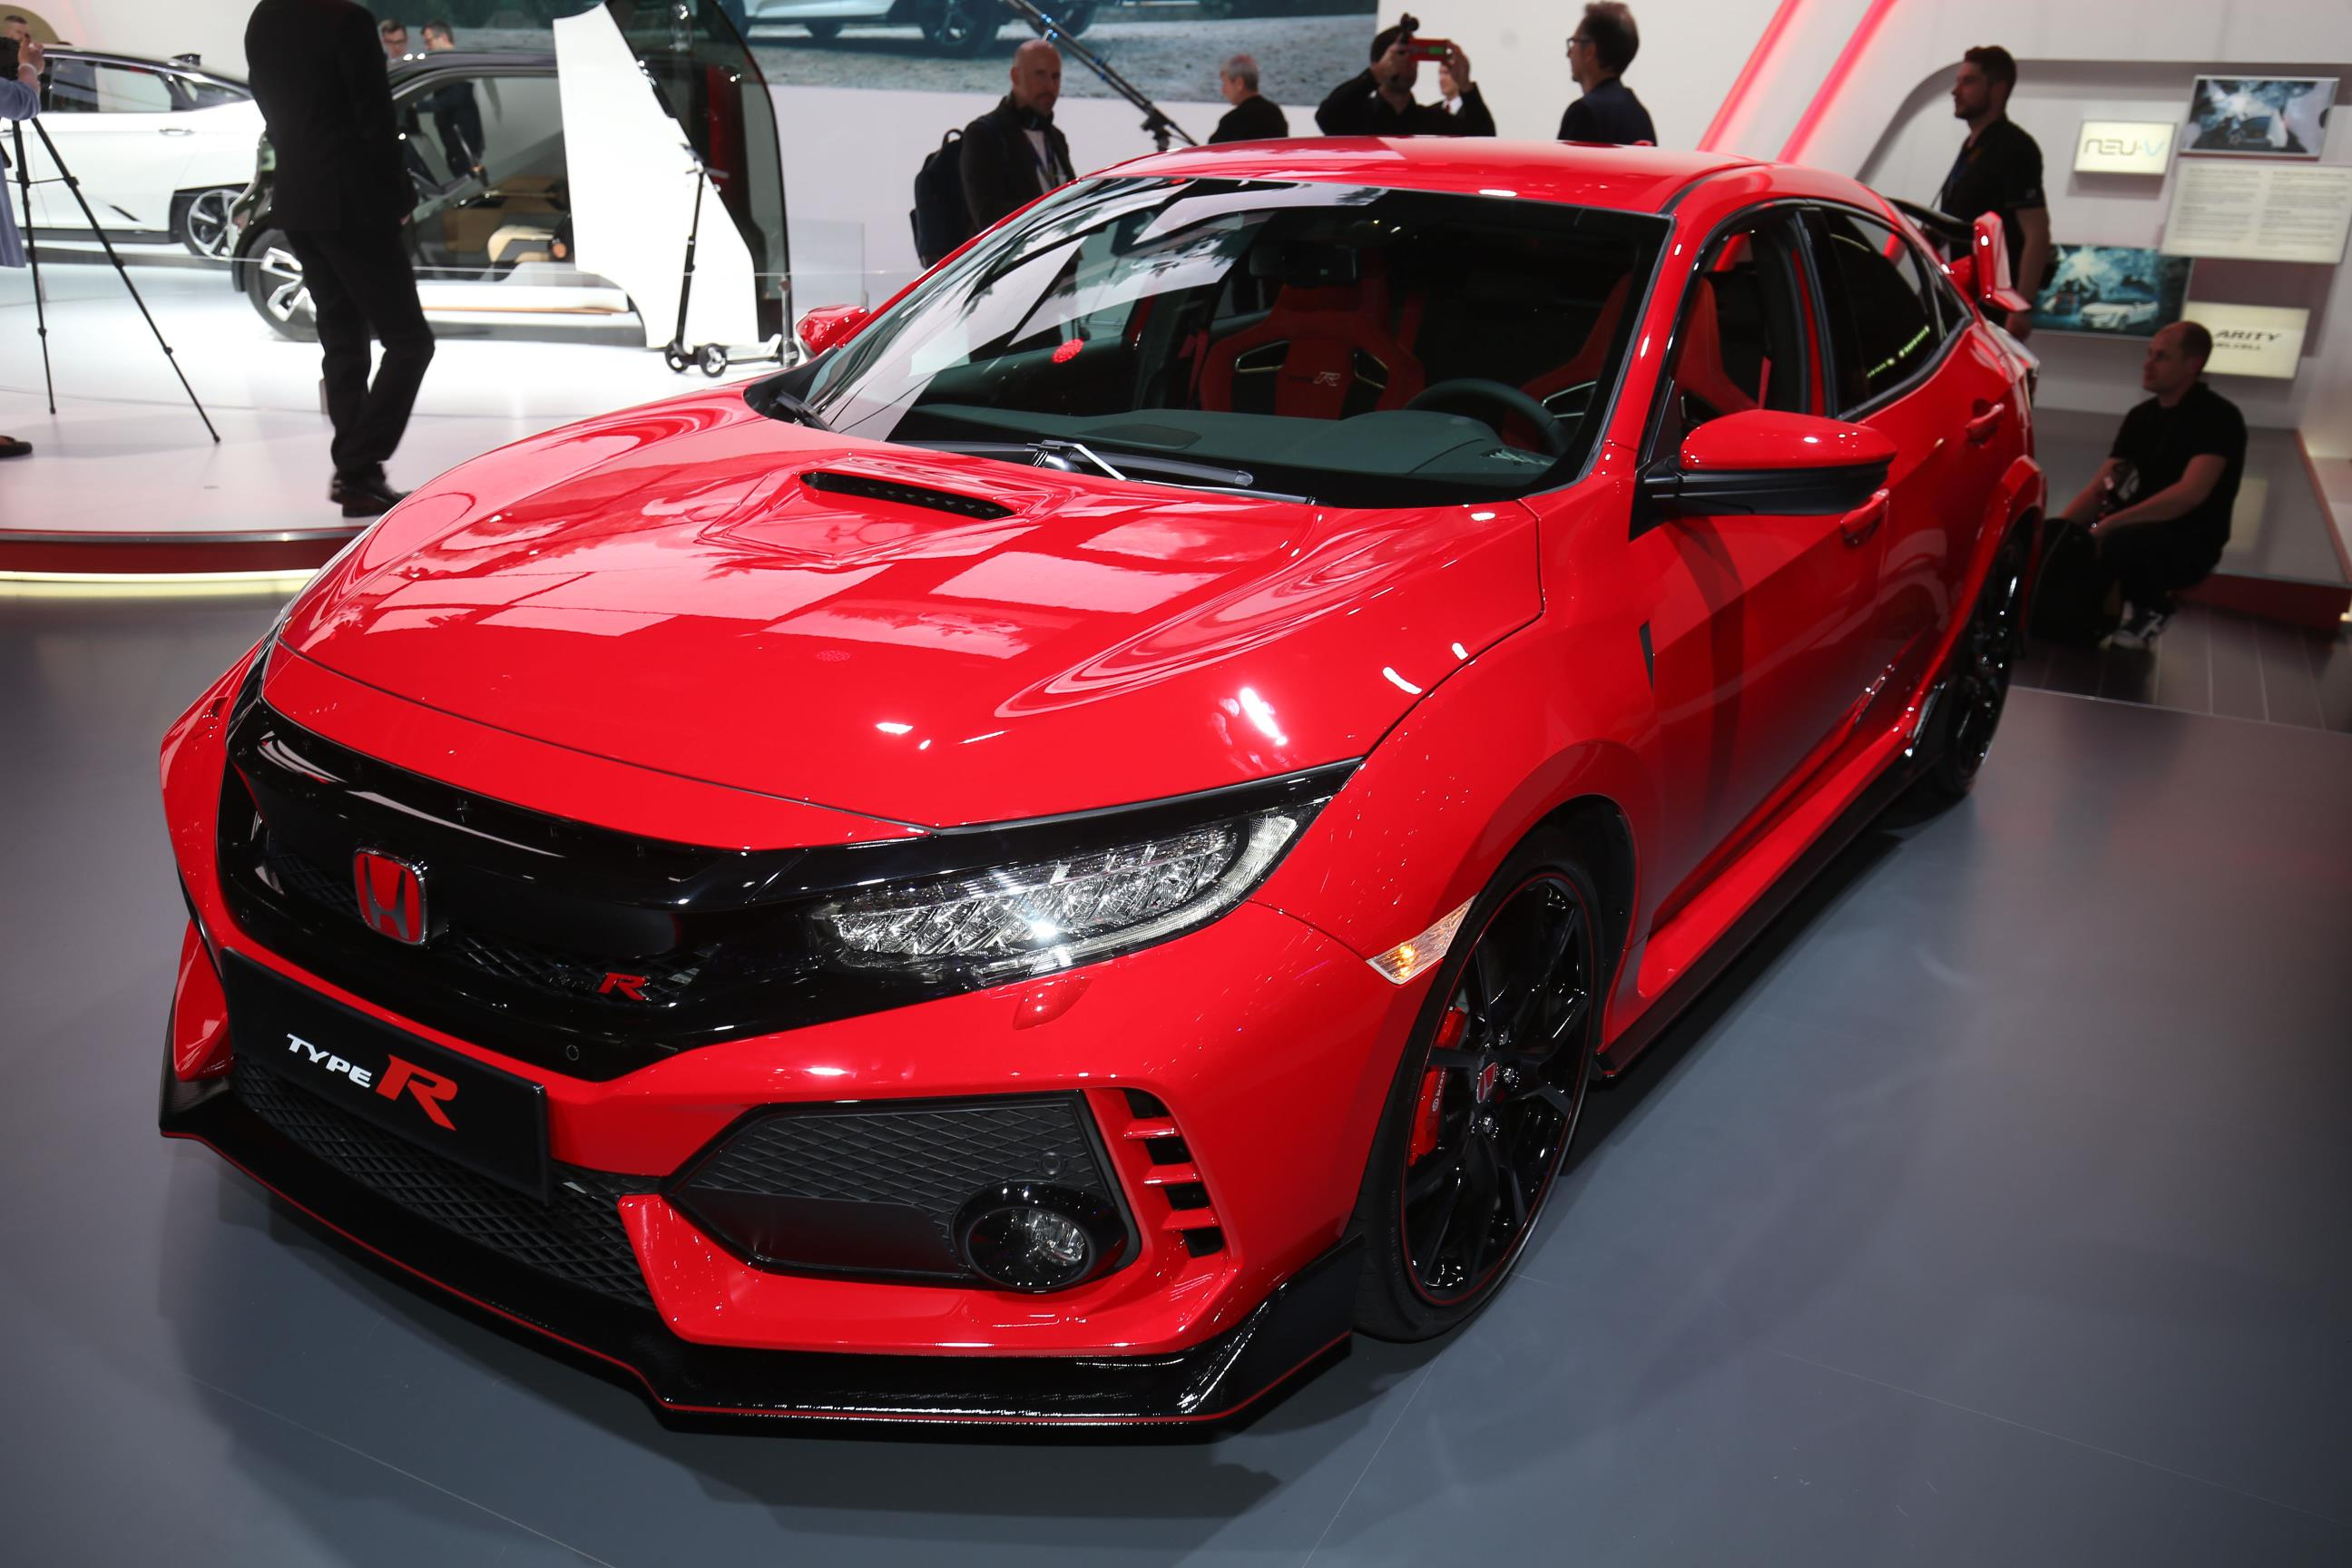 2018 Honda Civic Type R Makes Production Debut In Geneva